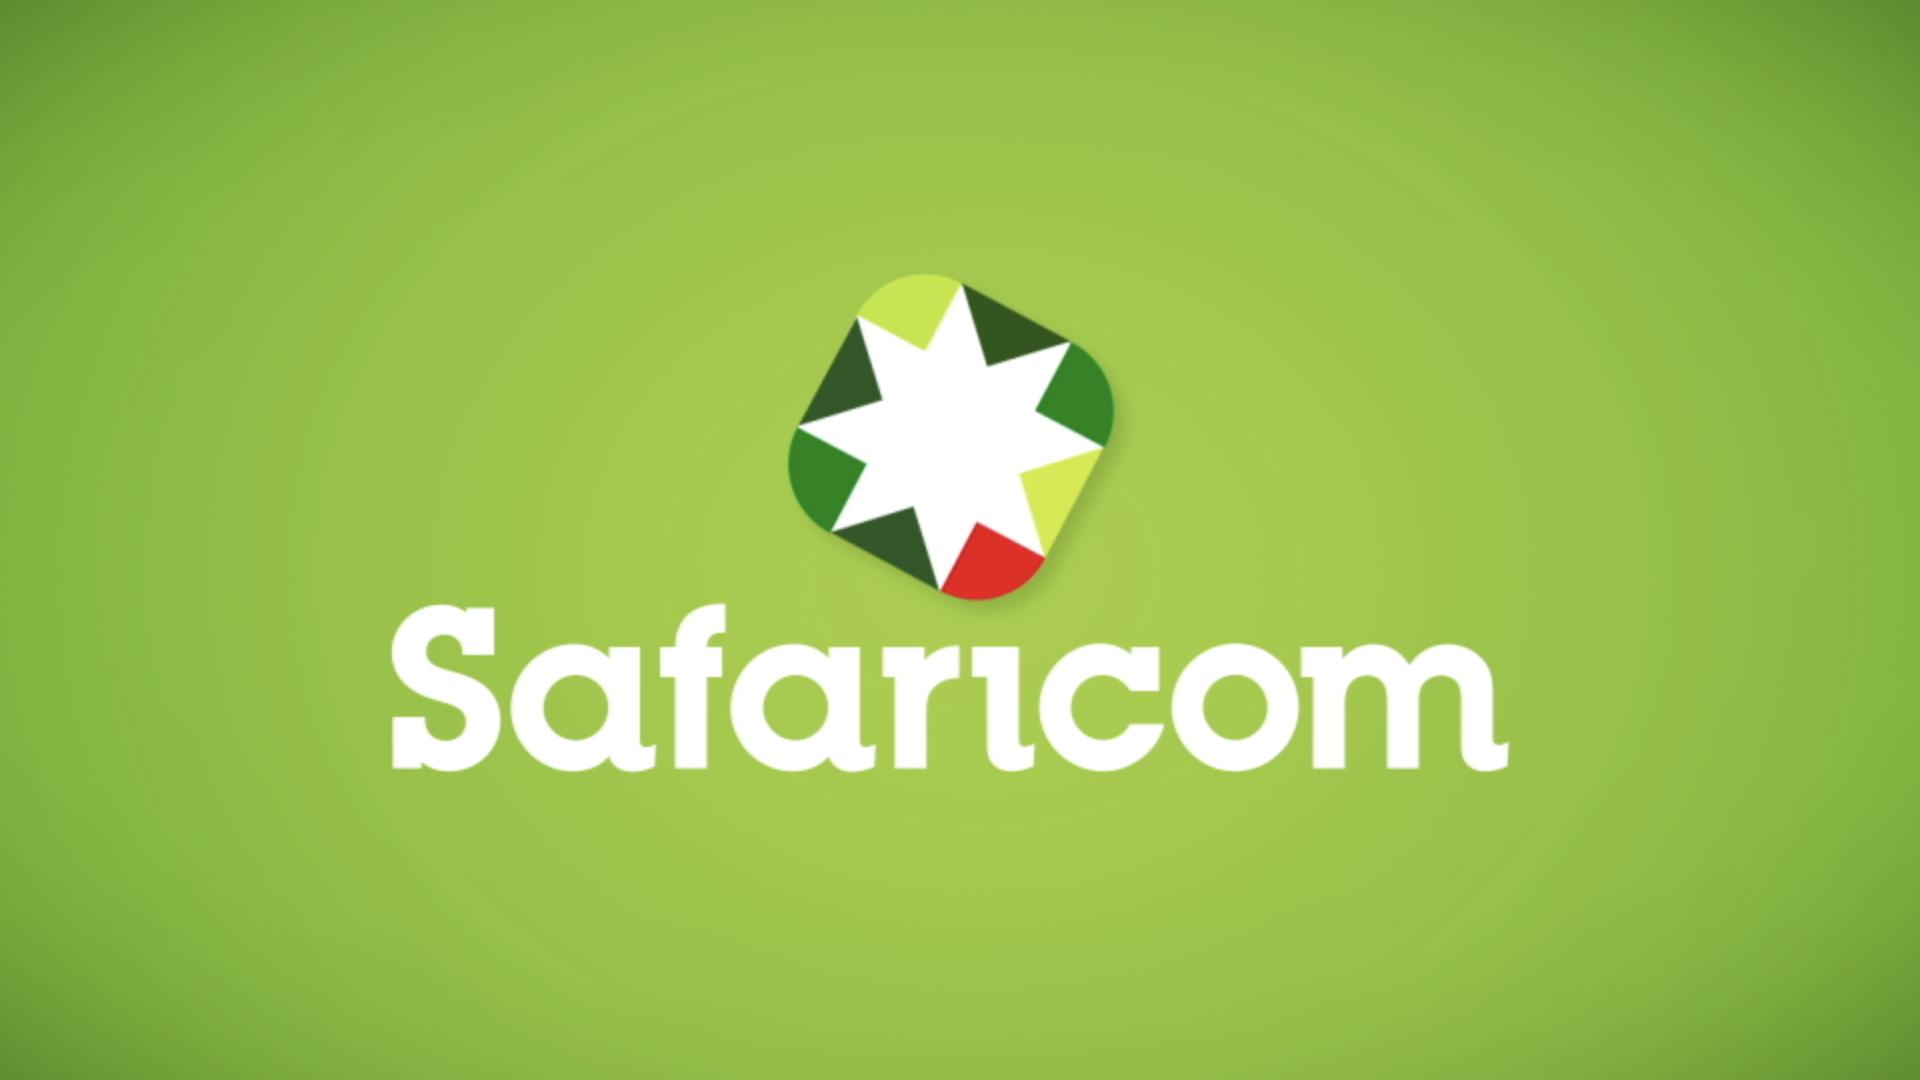 Safaricom.jpg